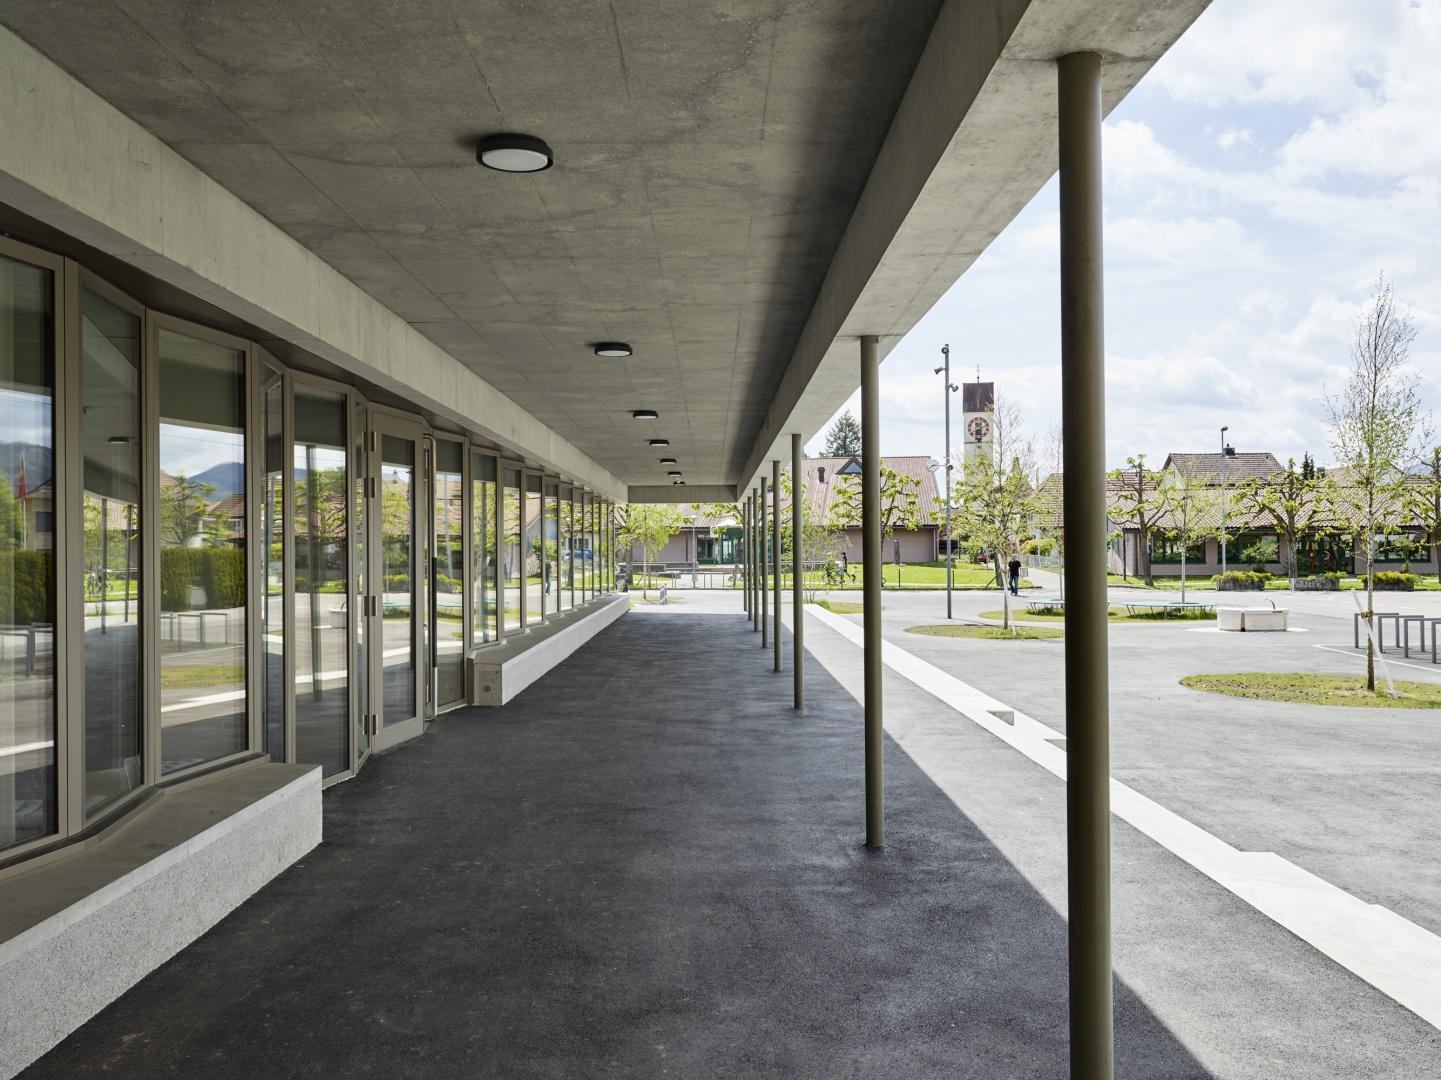 Entrée © Michael Fritschi, foto-werk gmbh,  Klingelbergstrasse 97, 4056 Basel